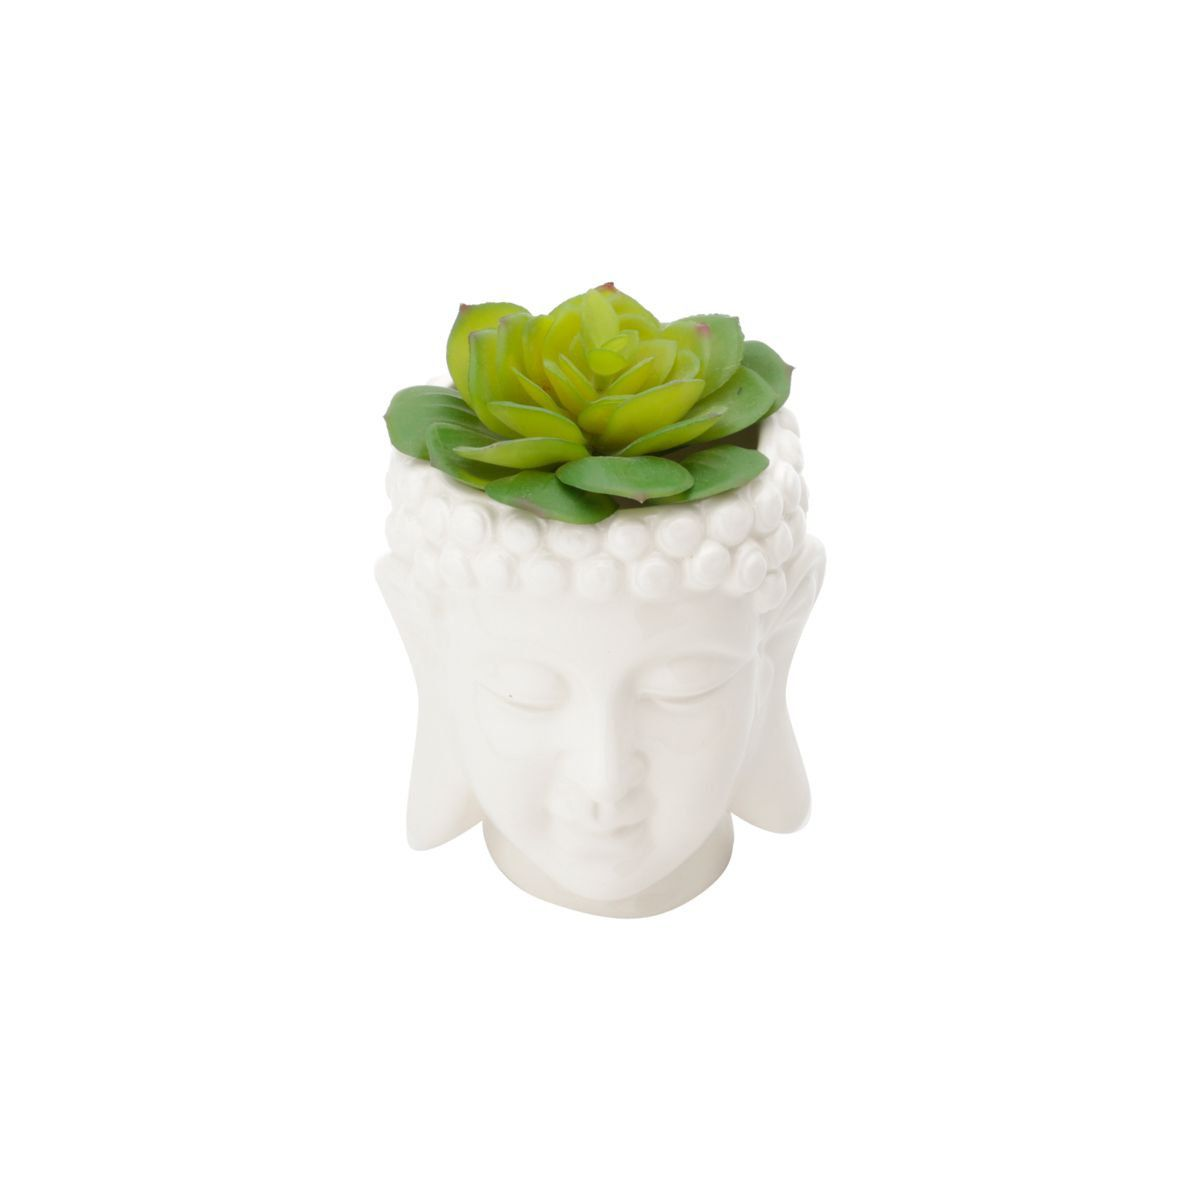 Cachepô de Cerâmica Budhas Head Branco 12,5cm x 11cm - 41014